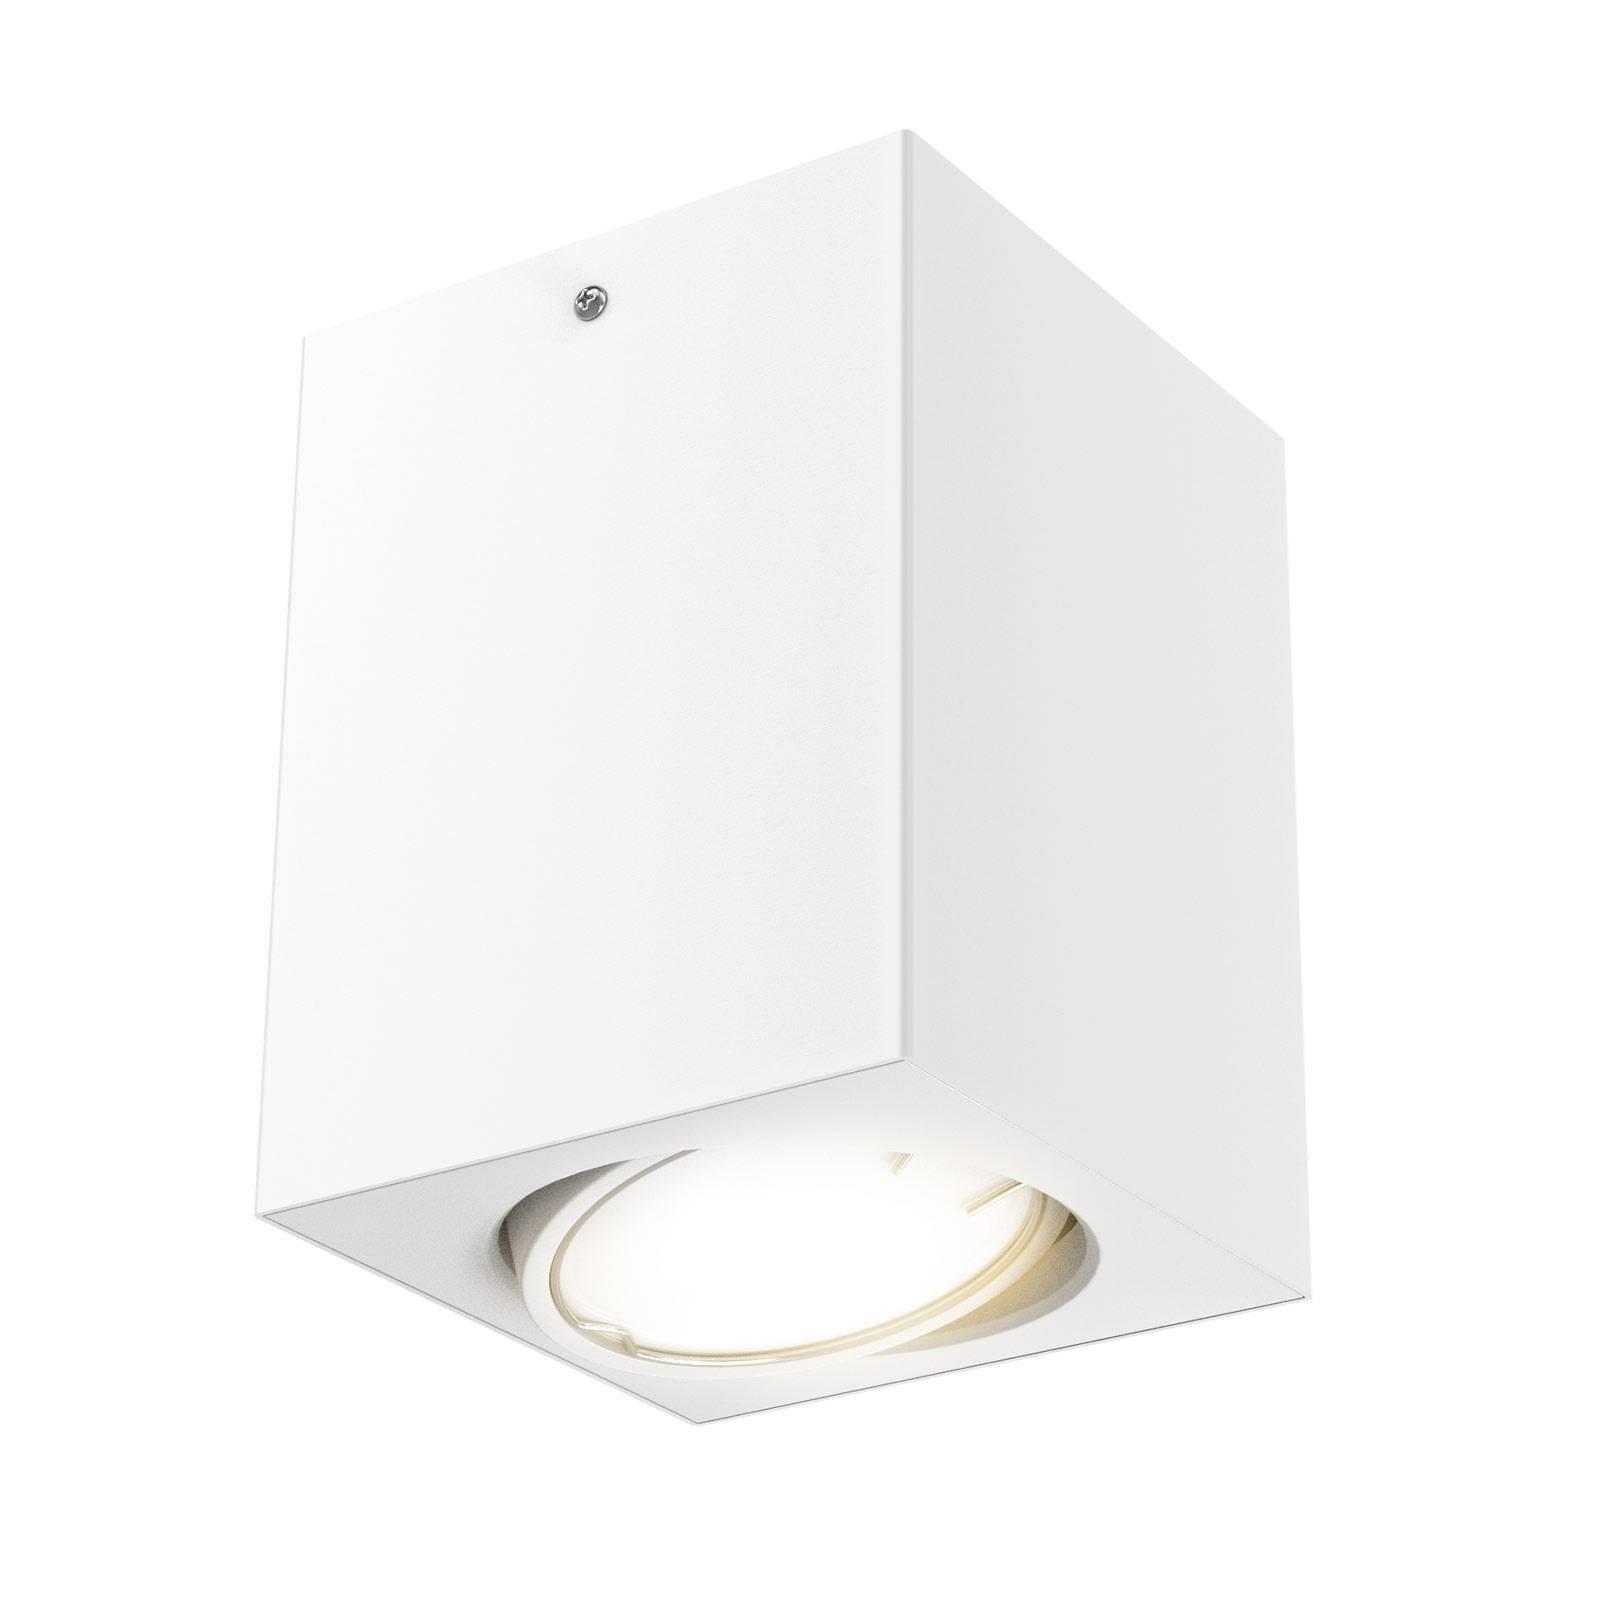 LED-kattospotti 7120, GU10-LED-lamppu, valkoinen